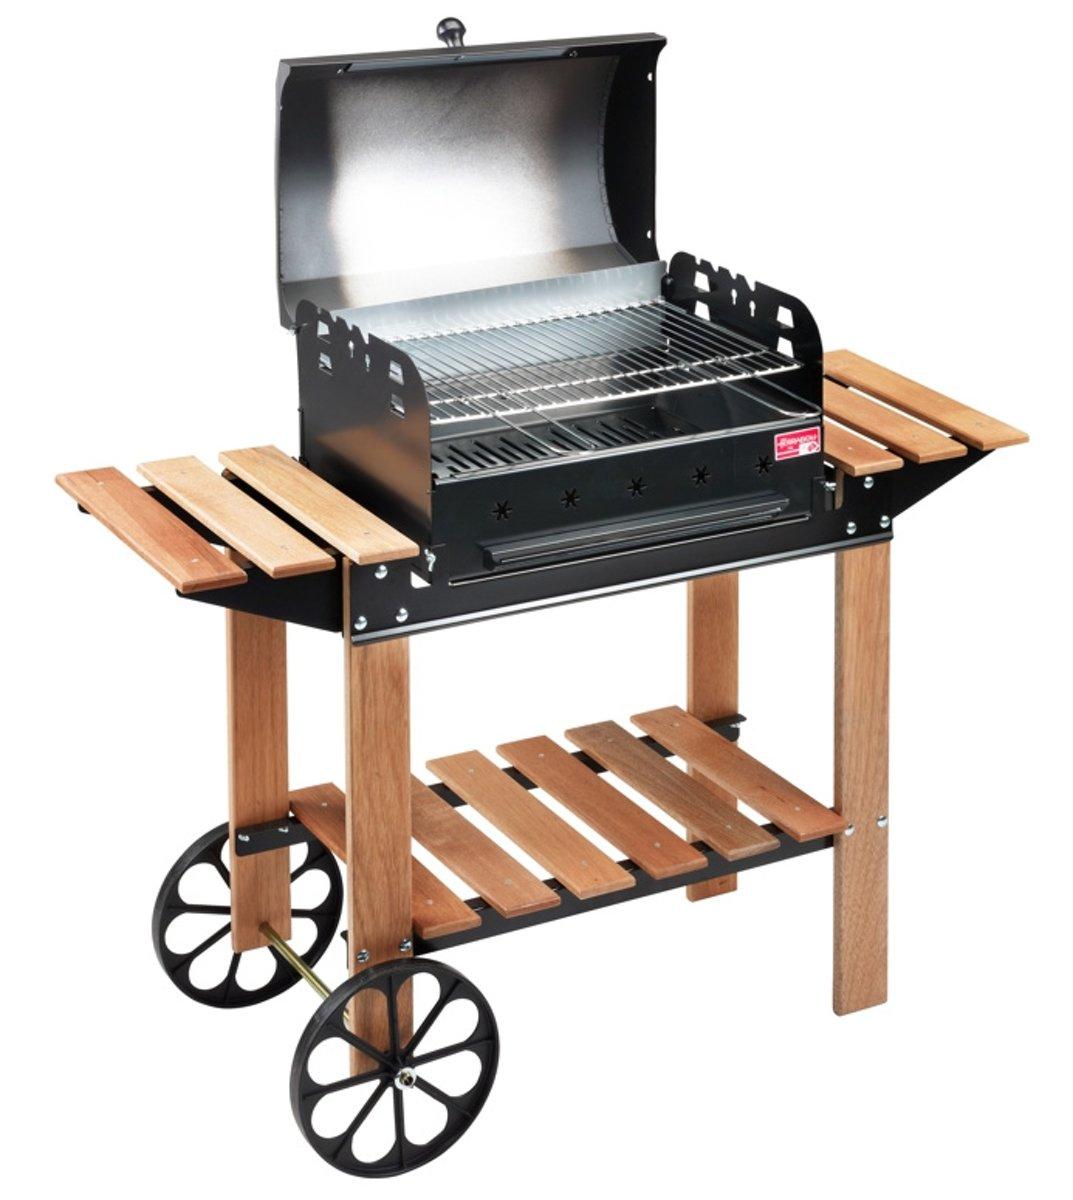 Barbecue Ferraboli Garda Legno kopen